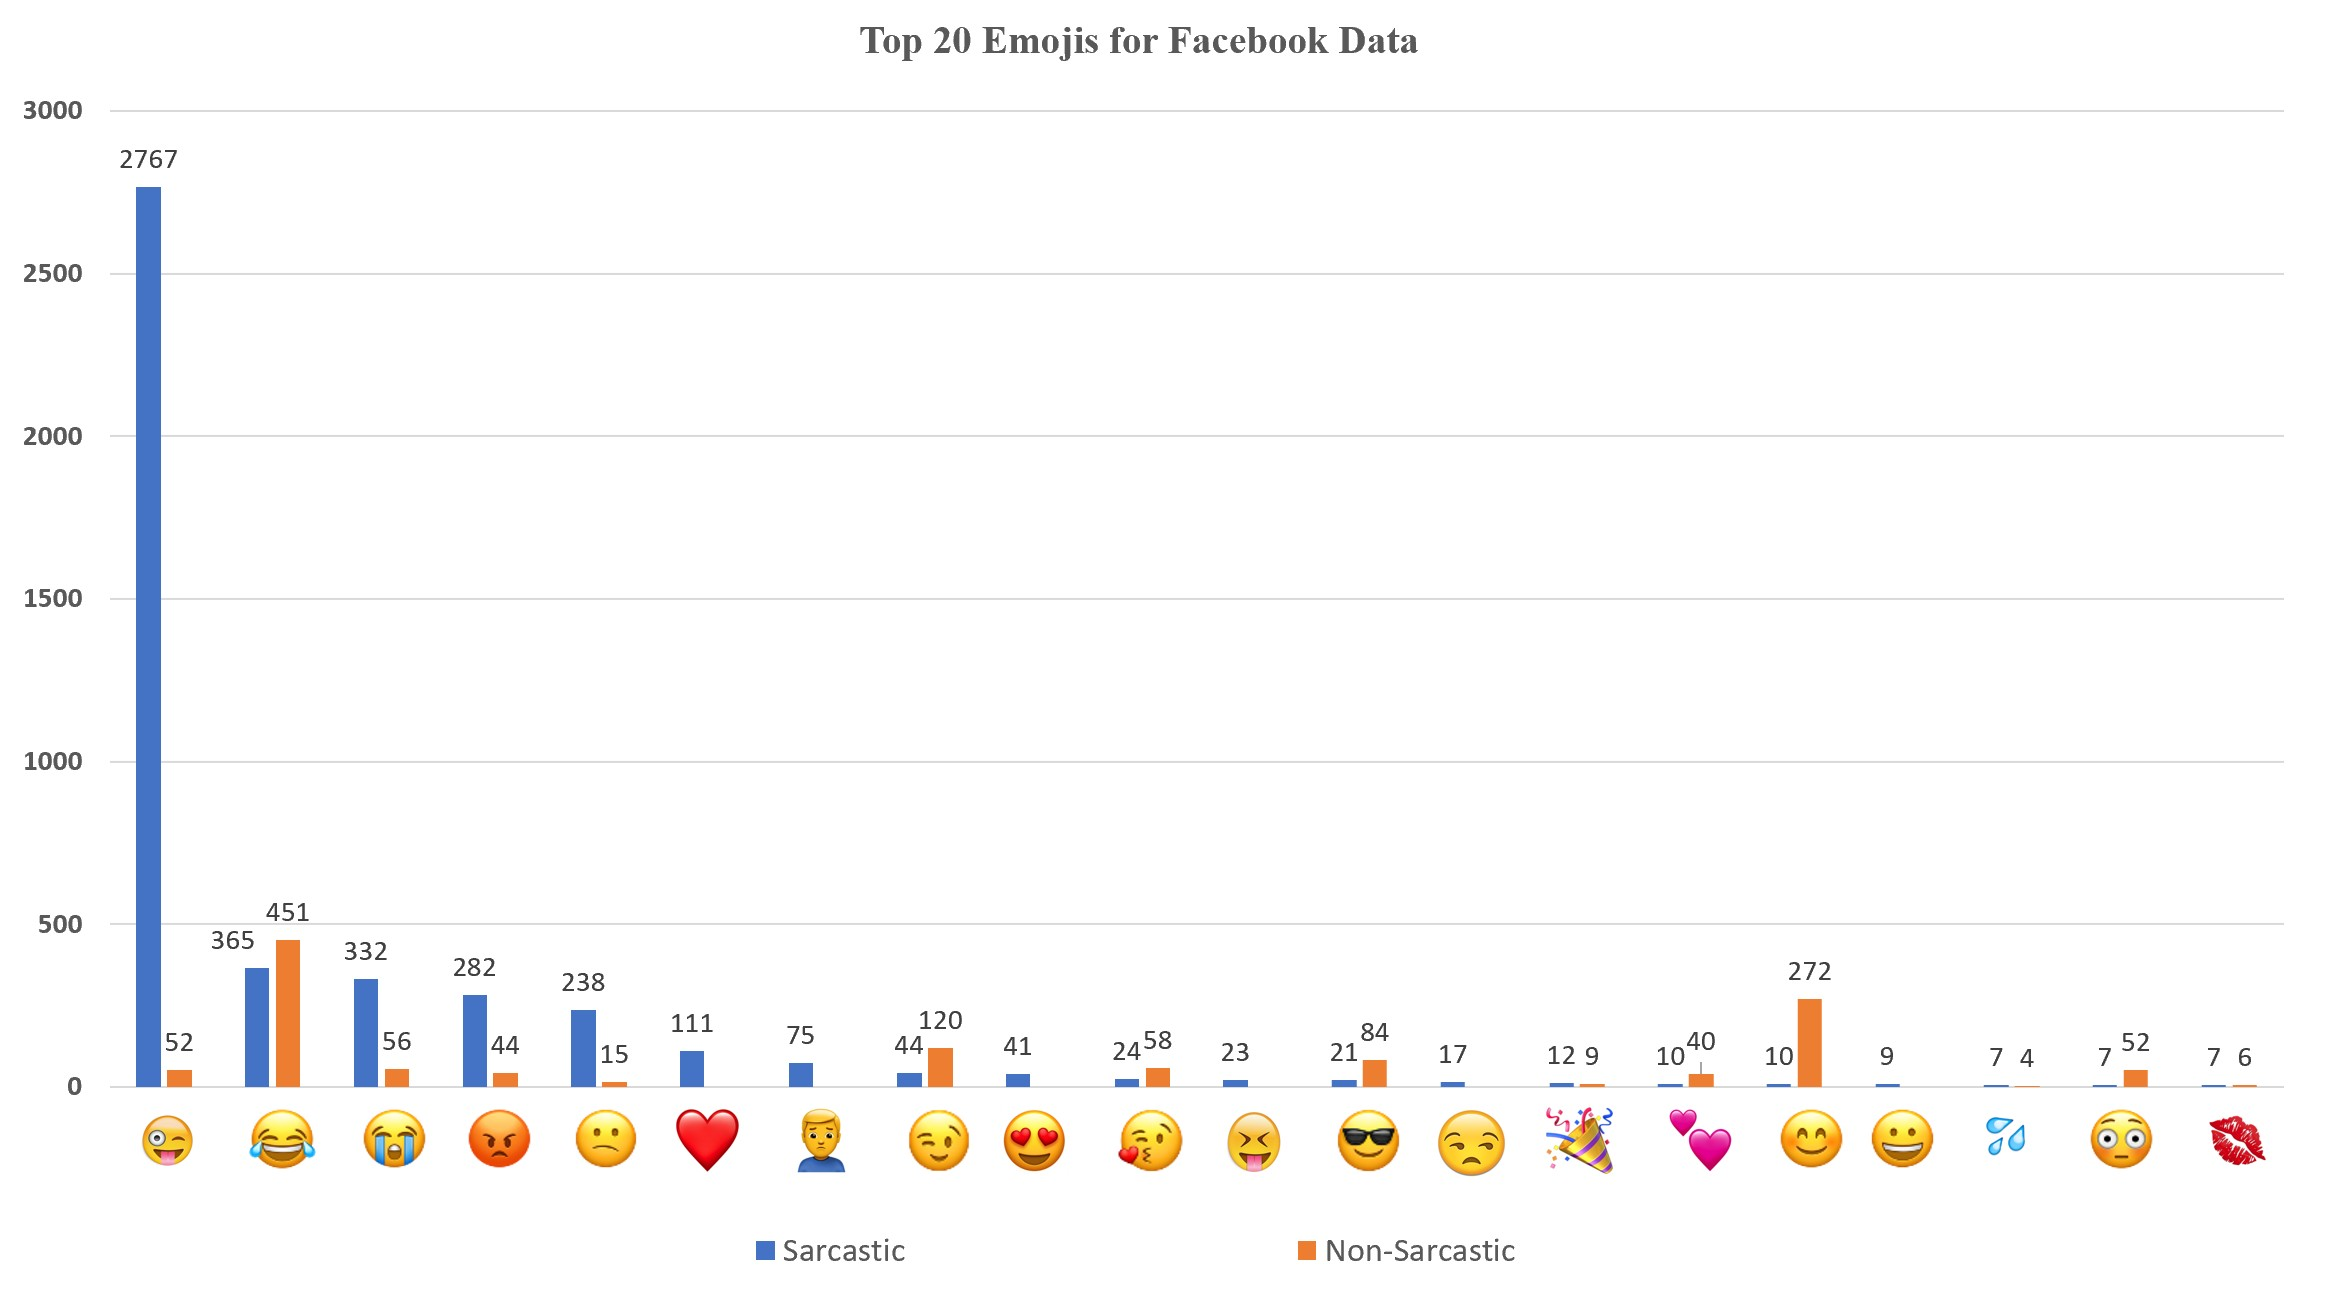 Comparison of top 20 Emojis for Facebook data.